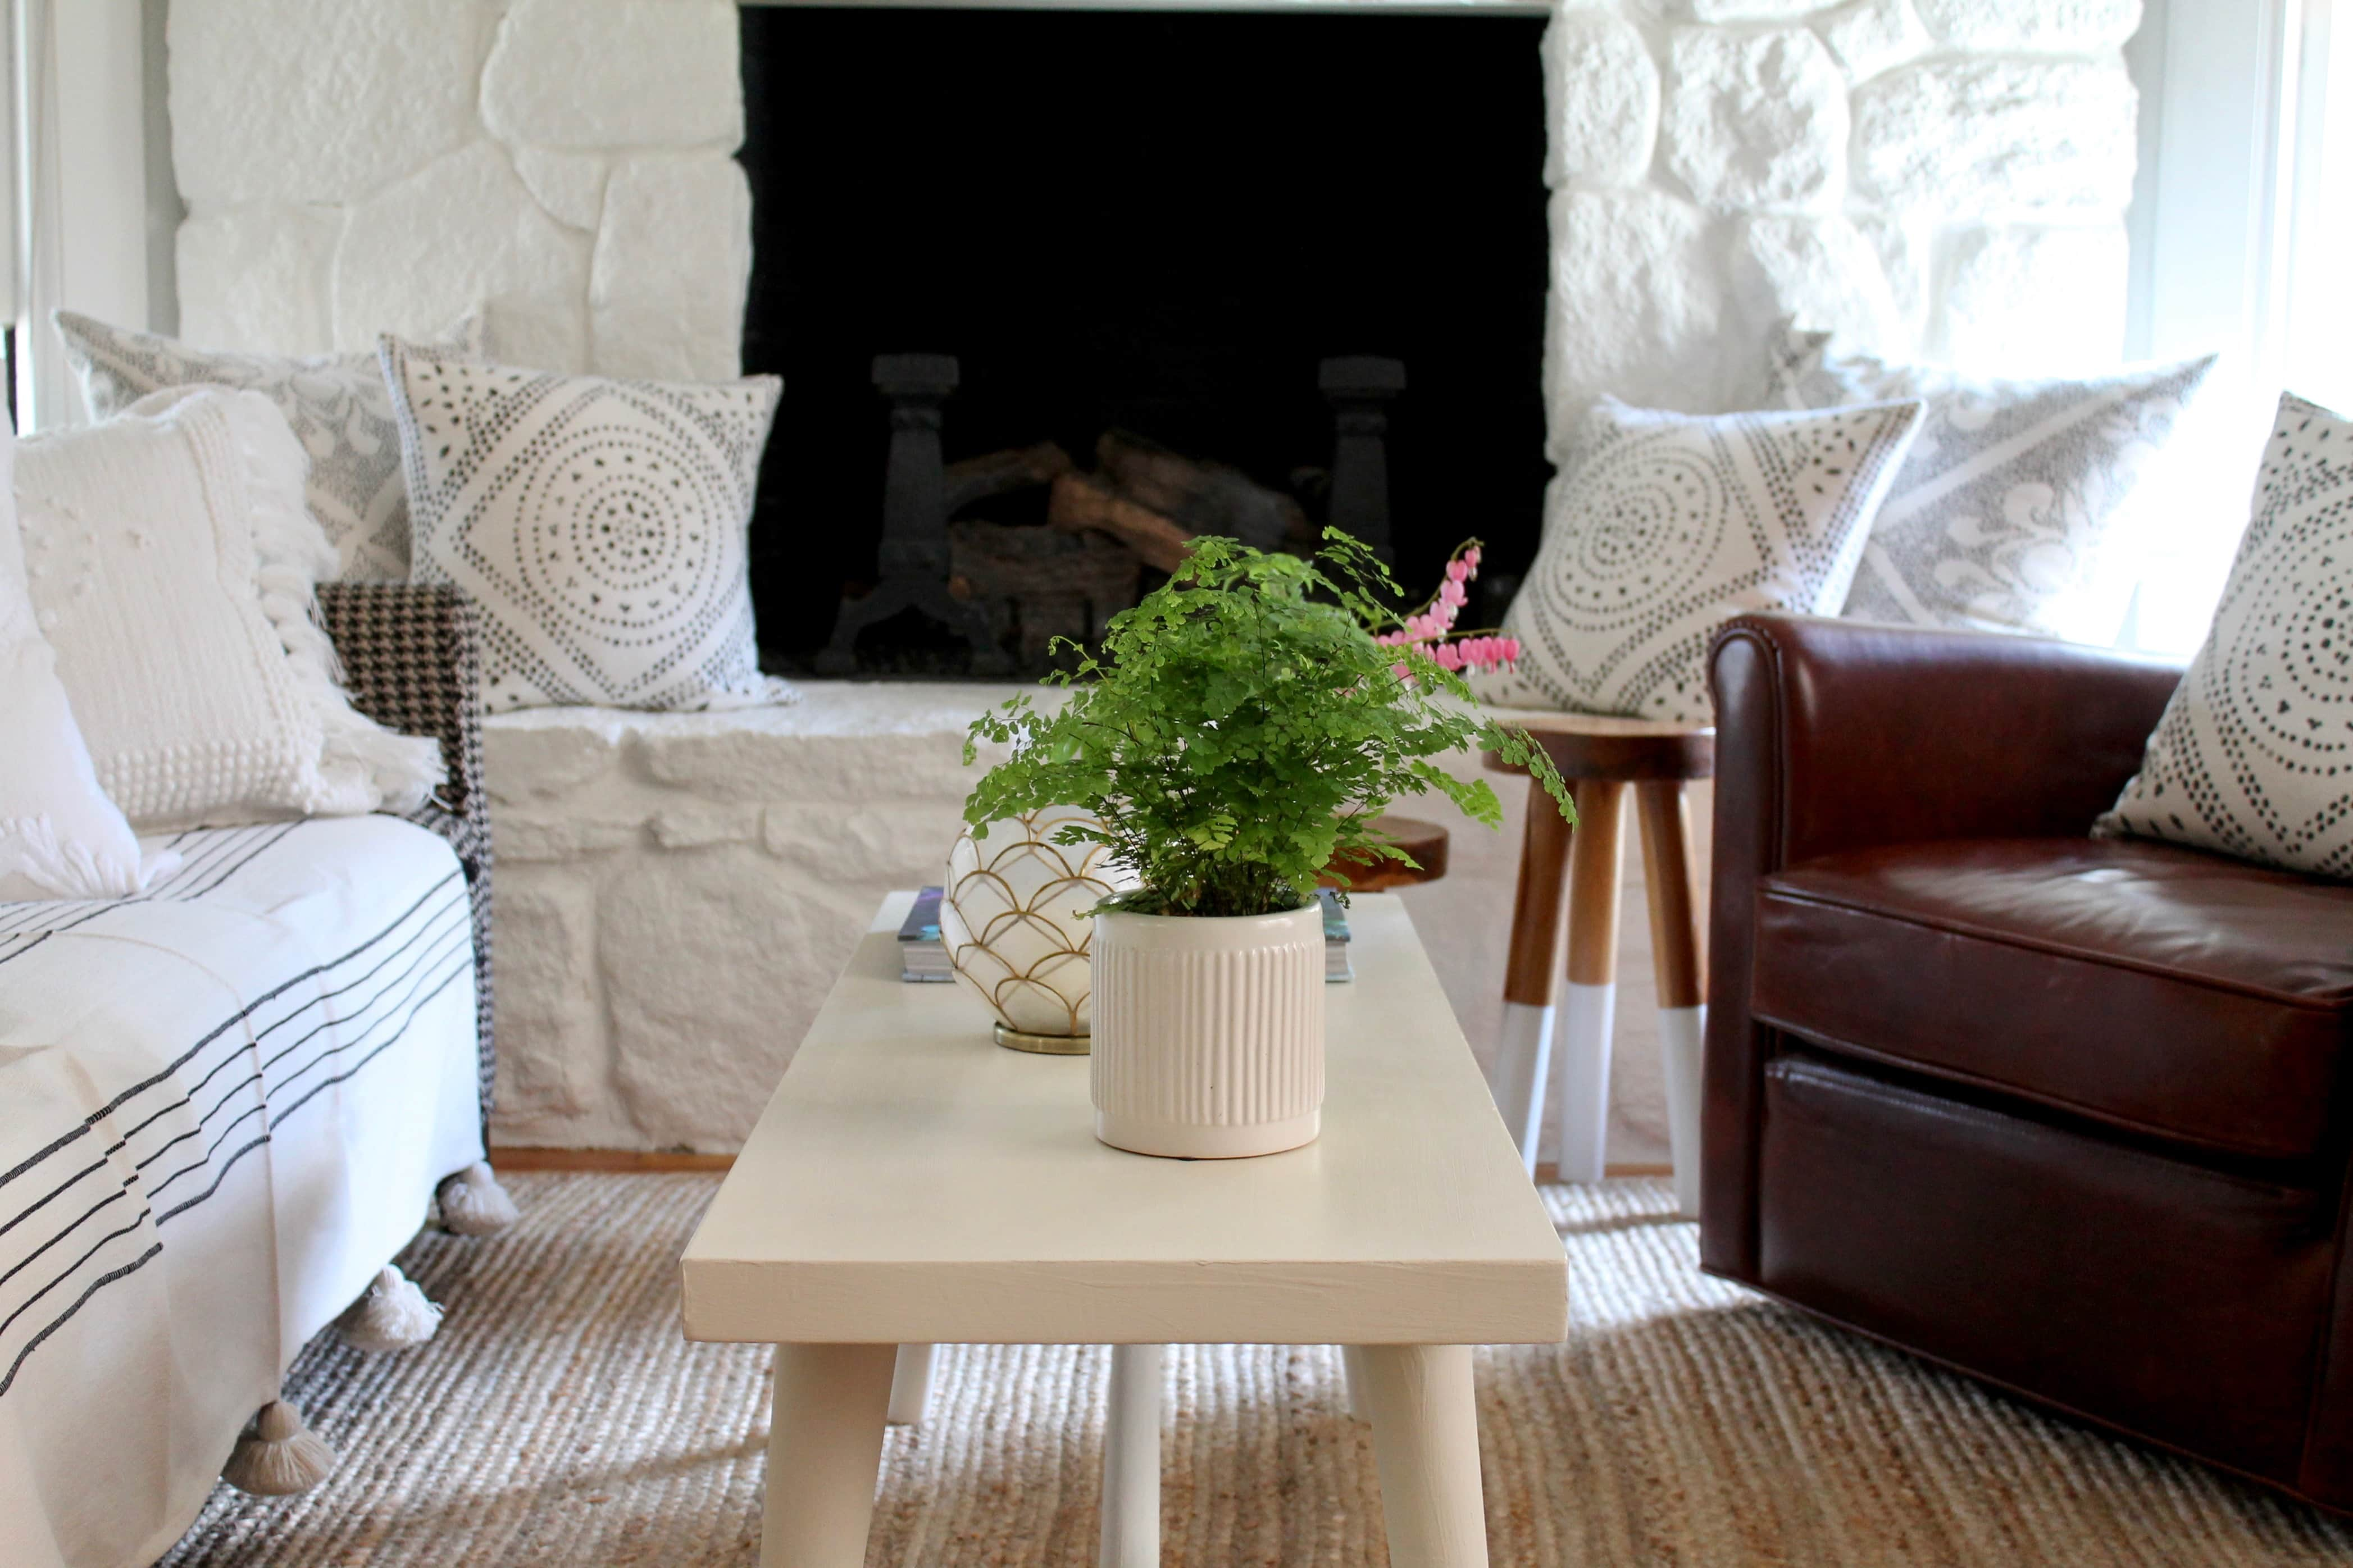 Annie Sloan Chalk Paint + Summer Living Room